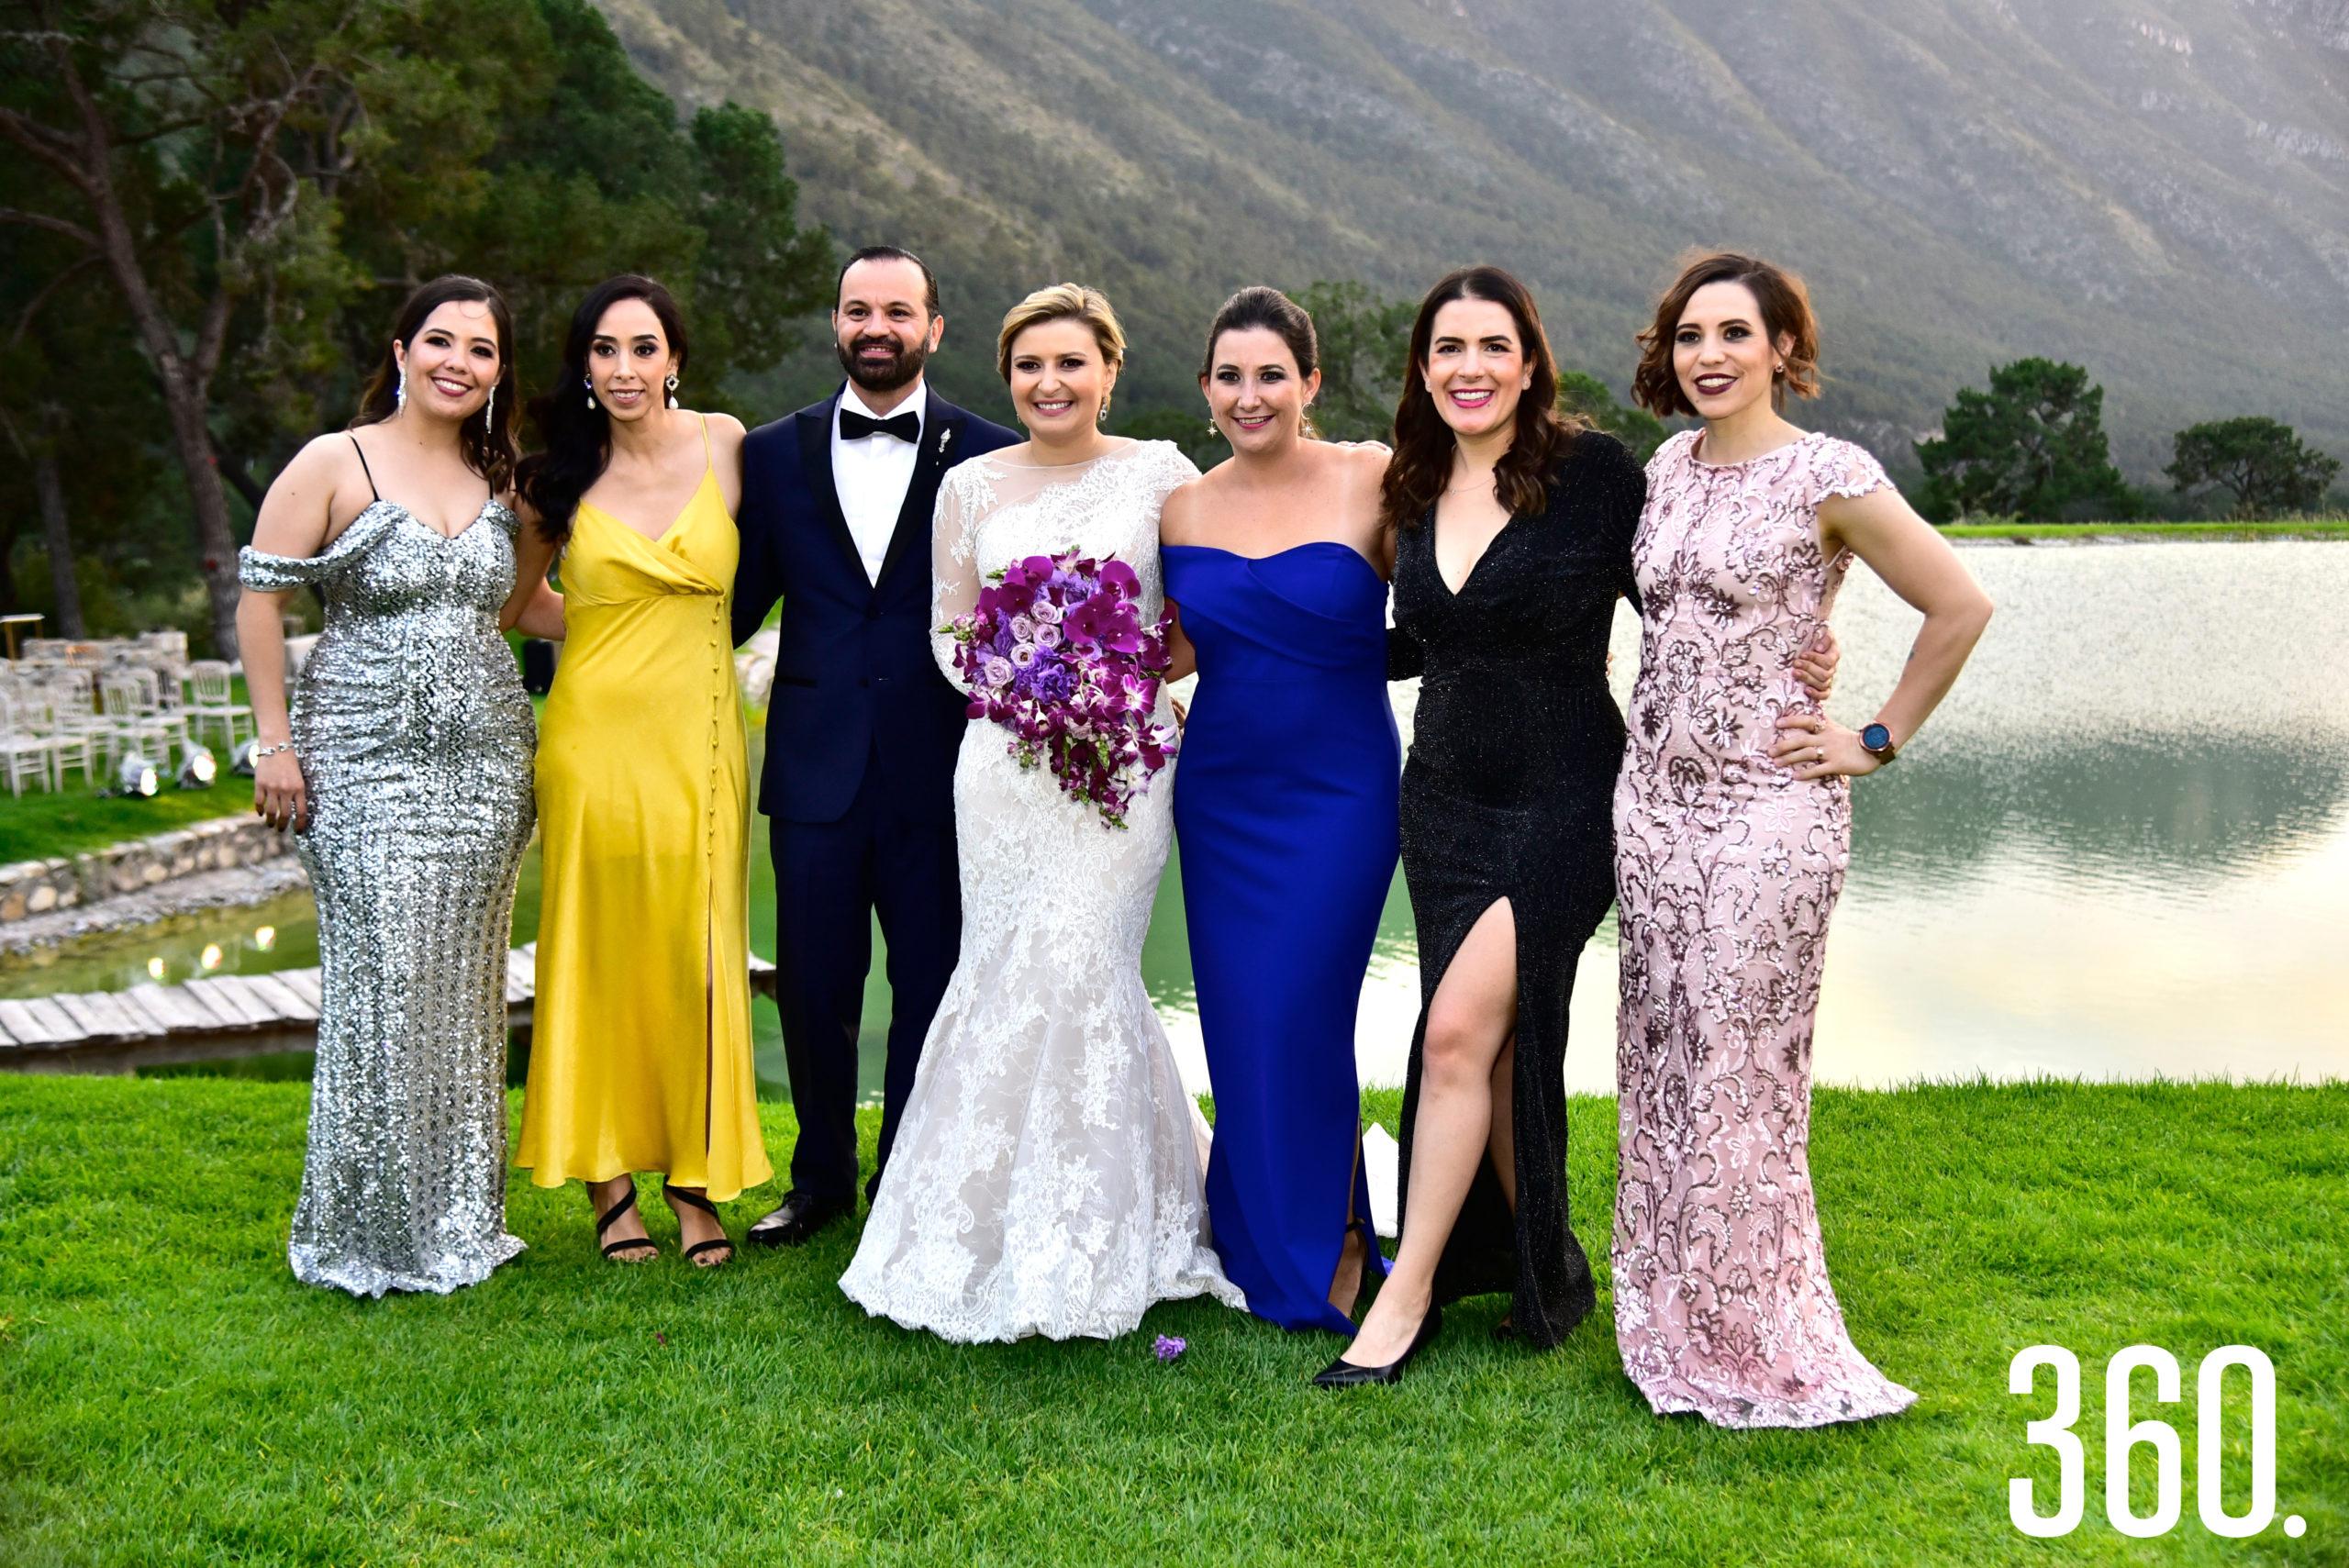 Tania Gil, Daniela Ramírez, Fernando González, Cecilia de la Garza, Jessica Saucedo, Elsa Dávila y Silvana Segovia.